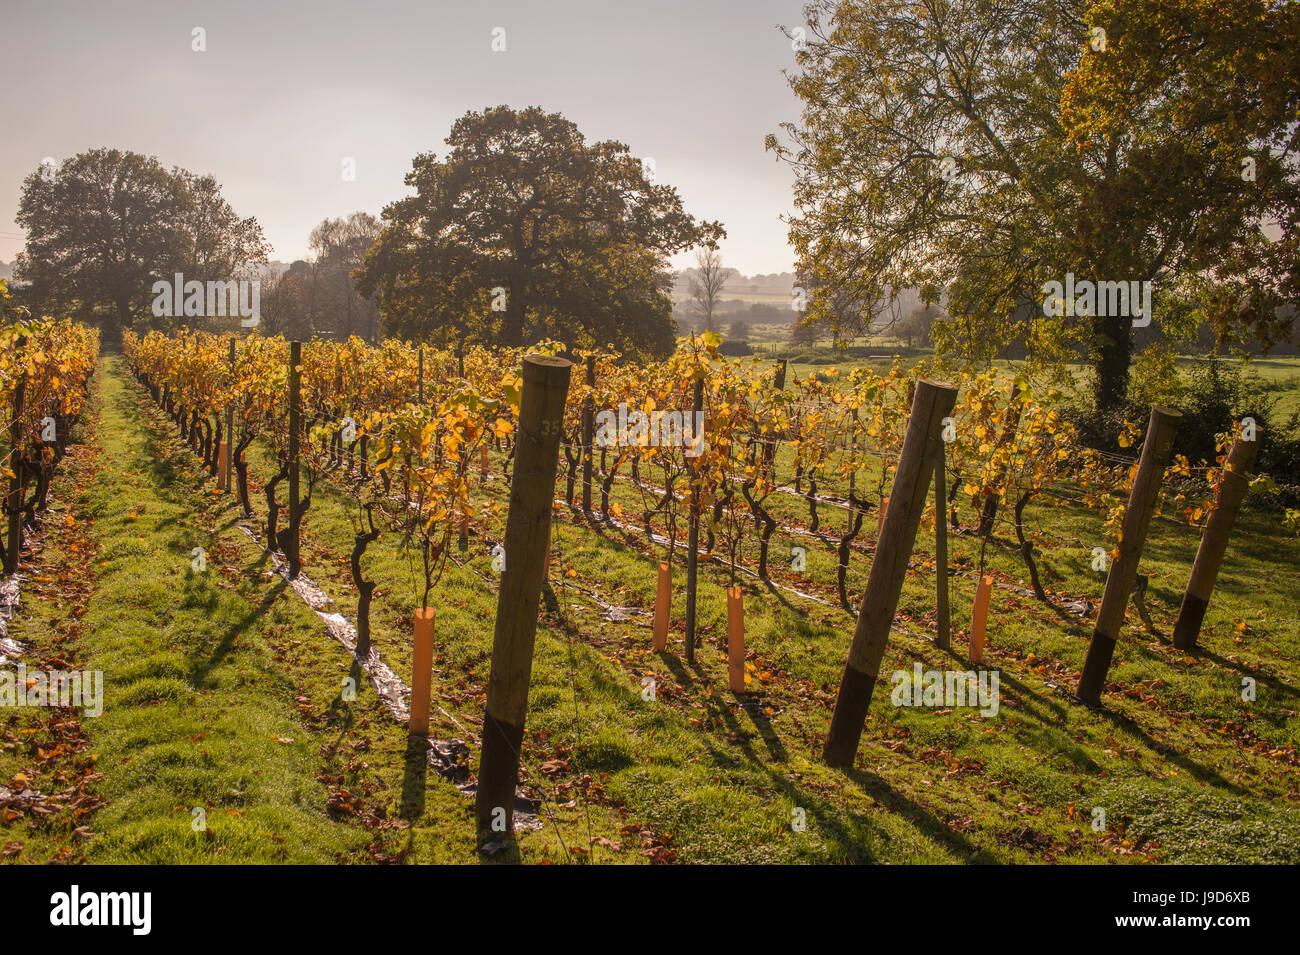 Vineyard, Chapel Down Winery, near Tenterden, Kent, England, United Kingdom, Europe - Stock Image